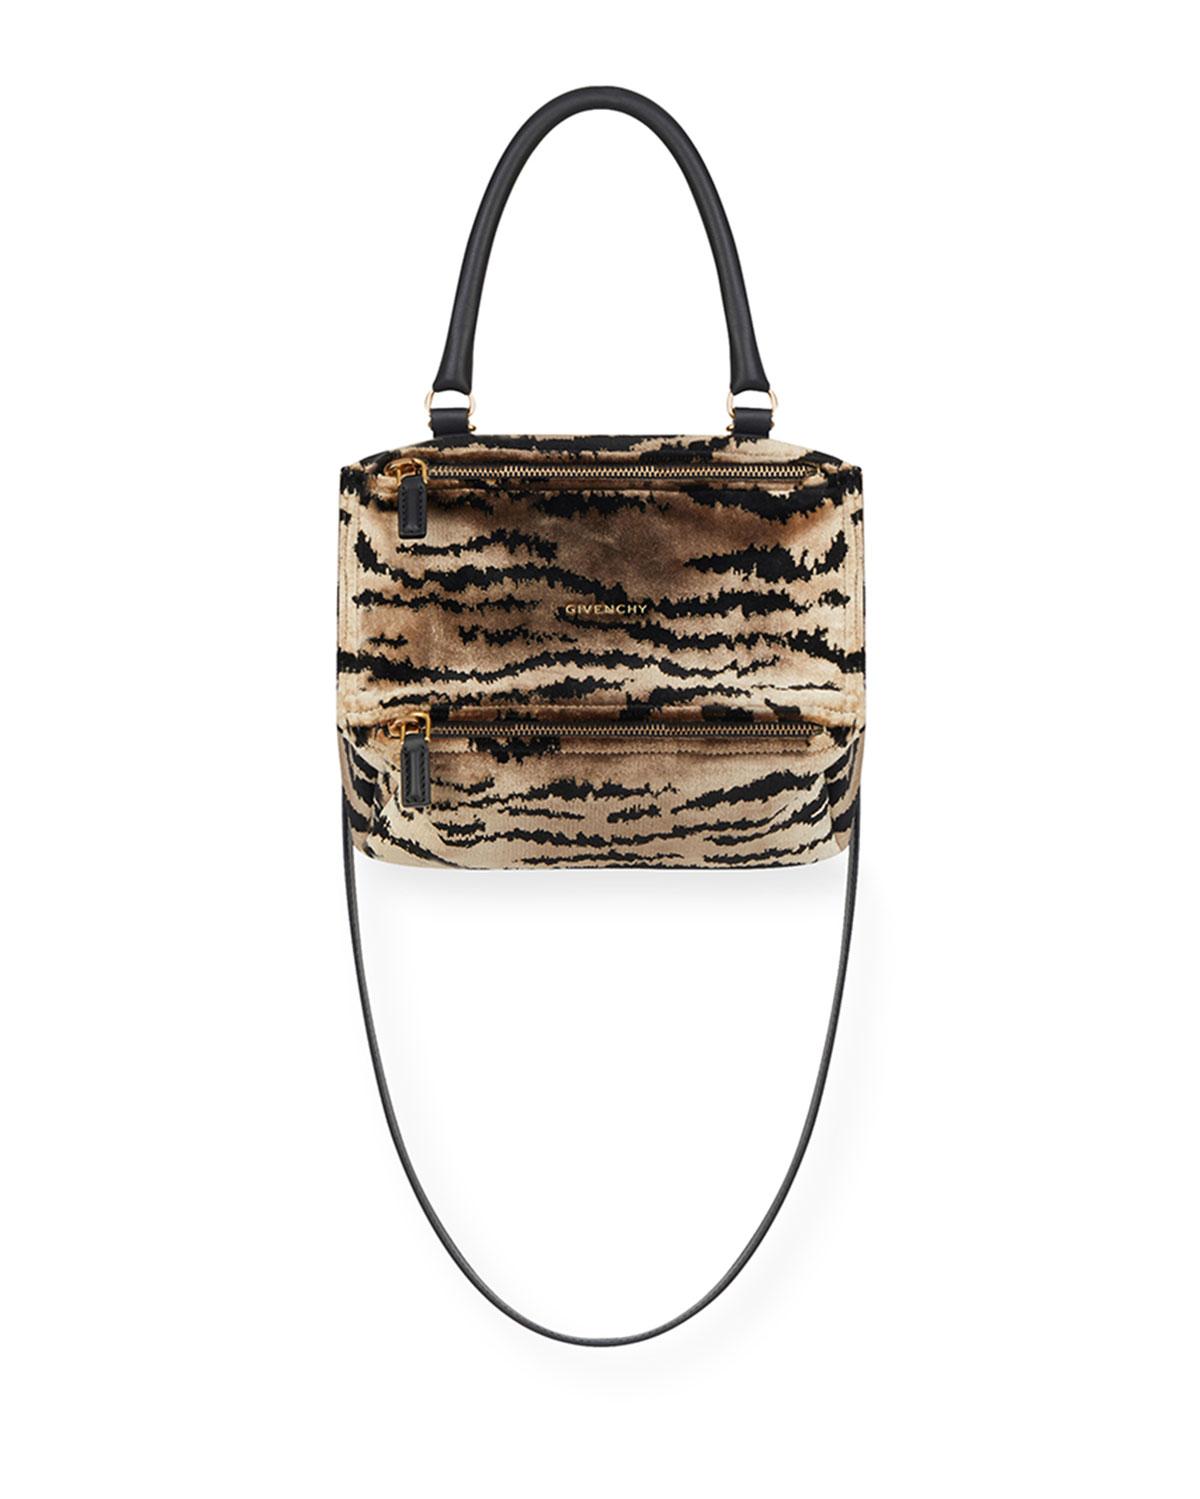 Pandora Velvet Animal-Print Small Satchel Bag